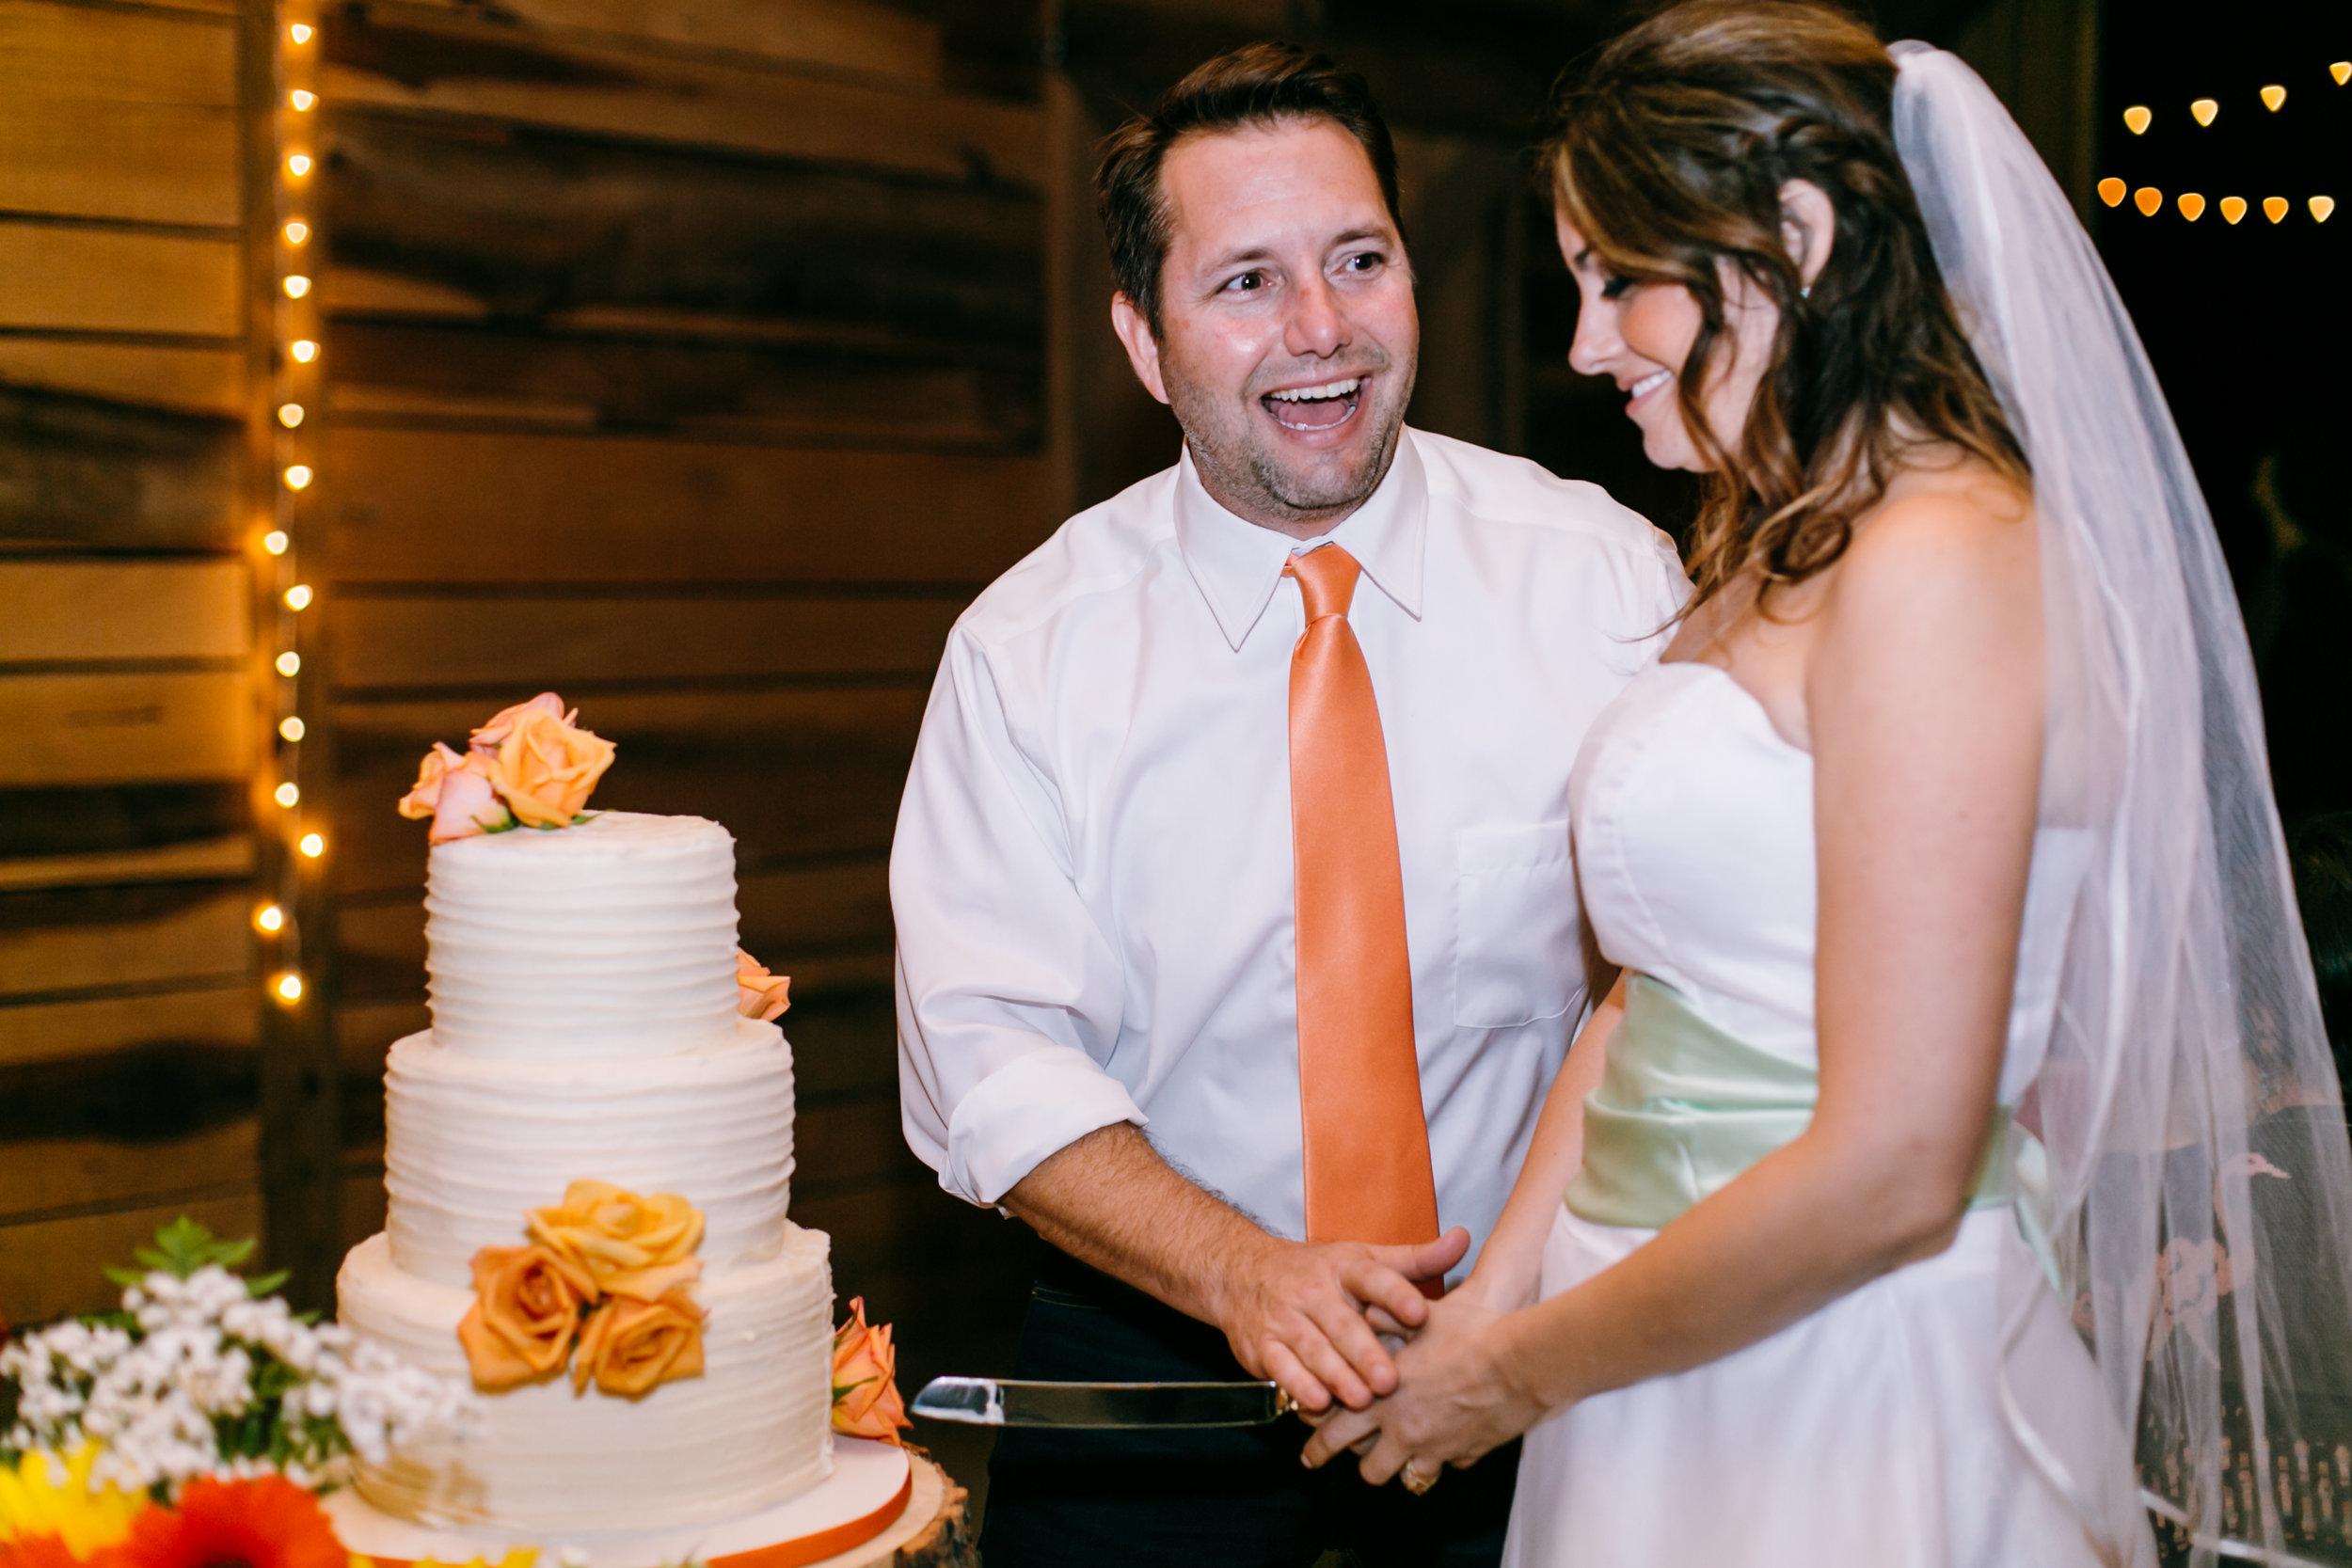 KaraNixonWeddings-Nashville-TN-Wedding-124.jpg